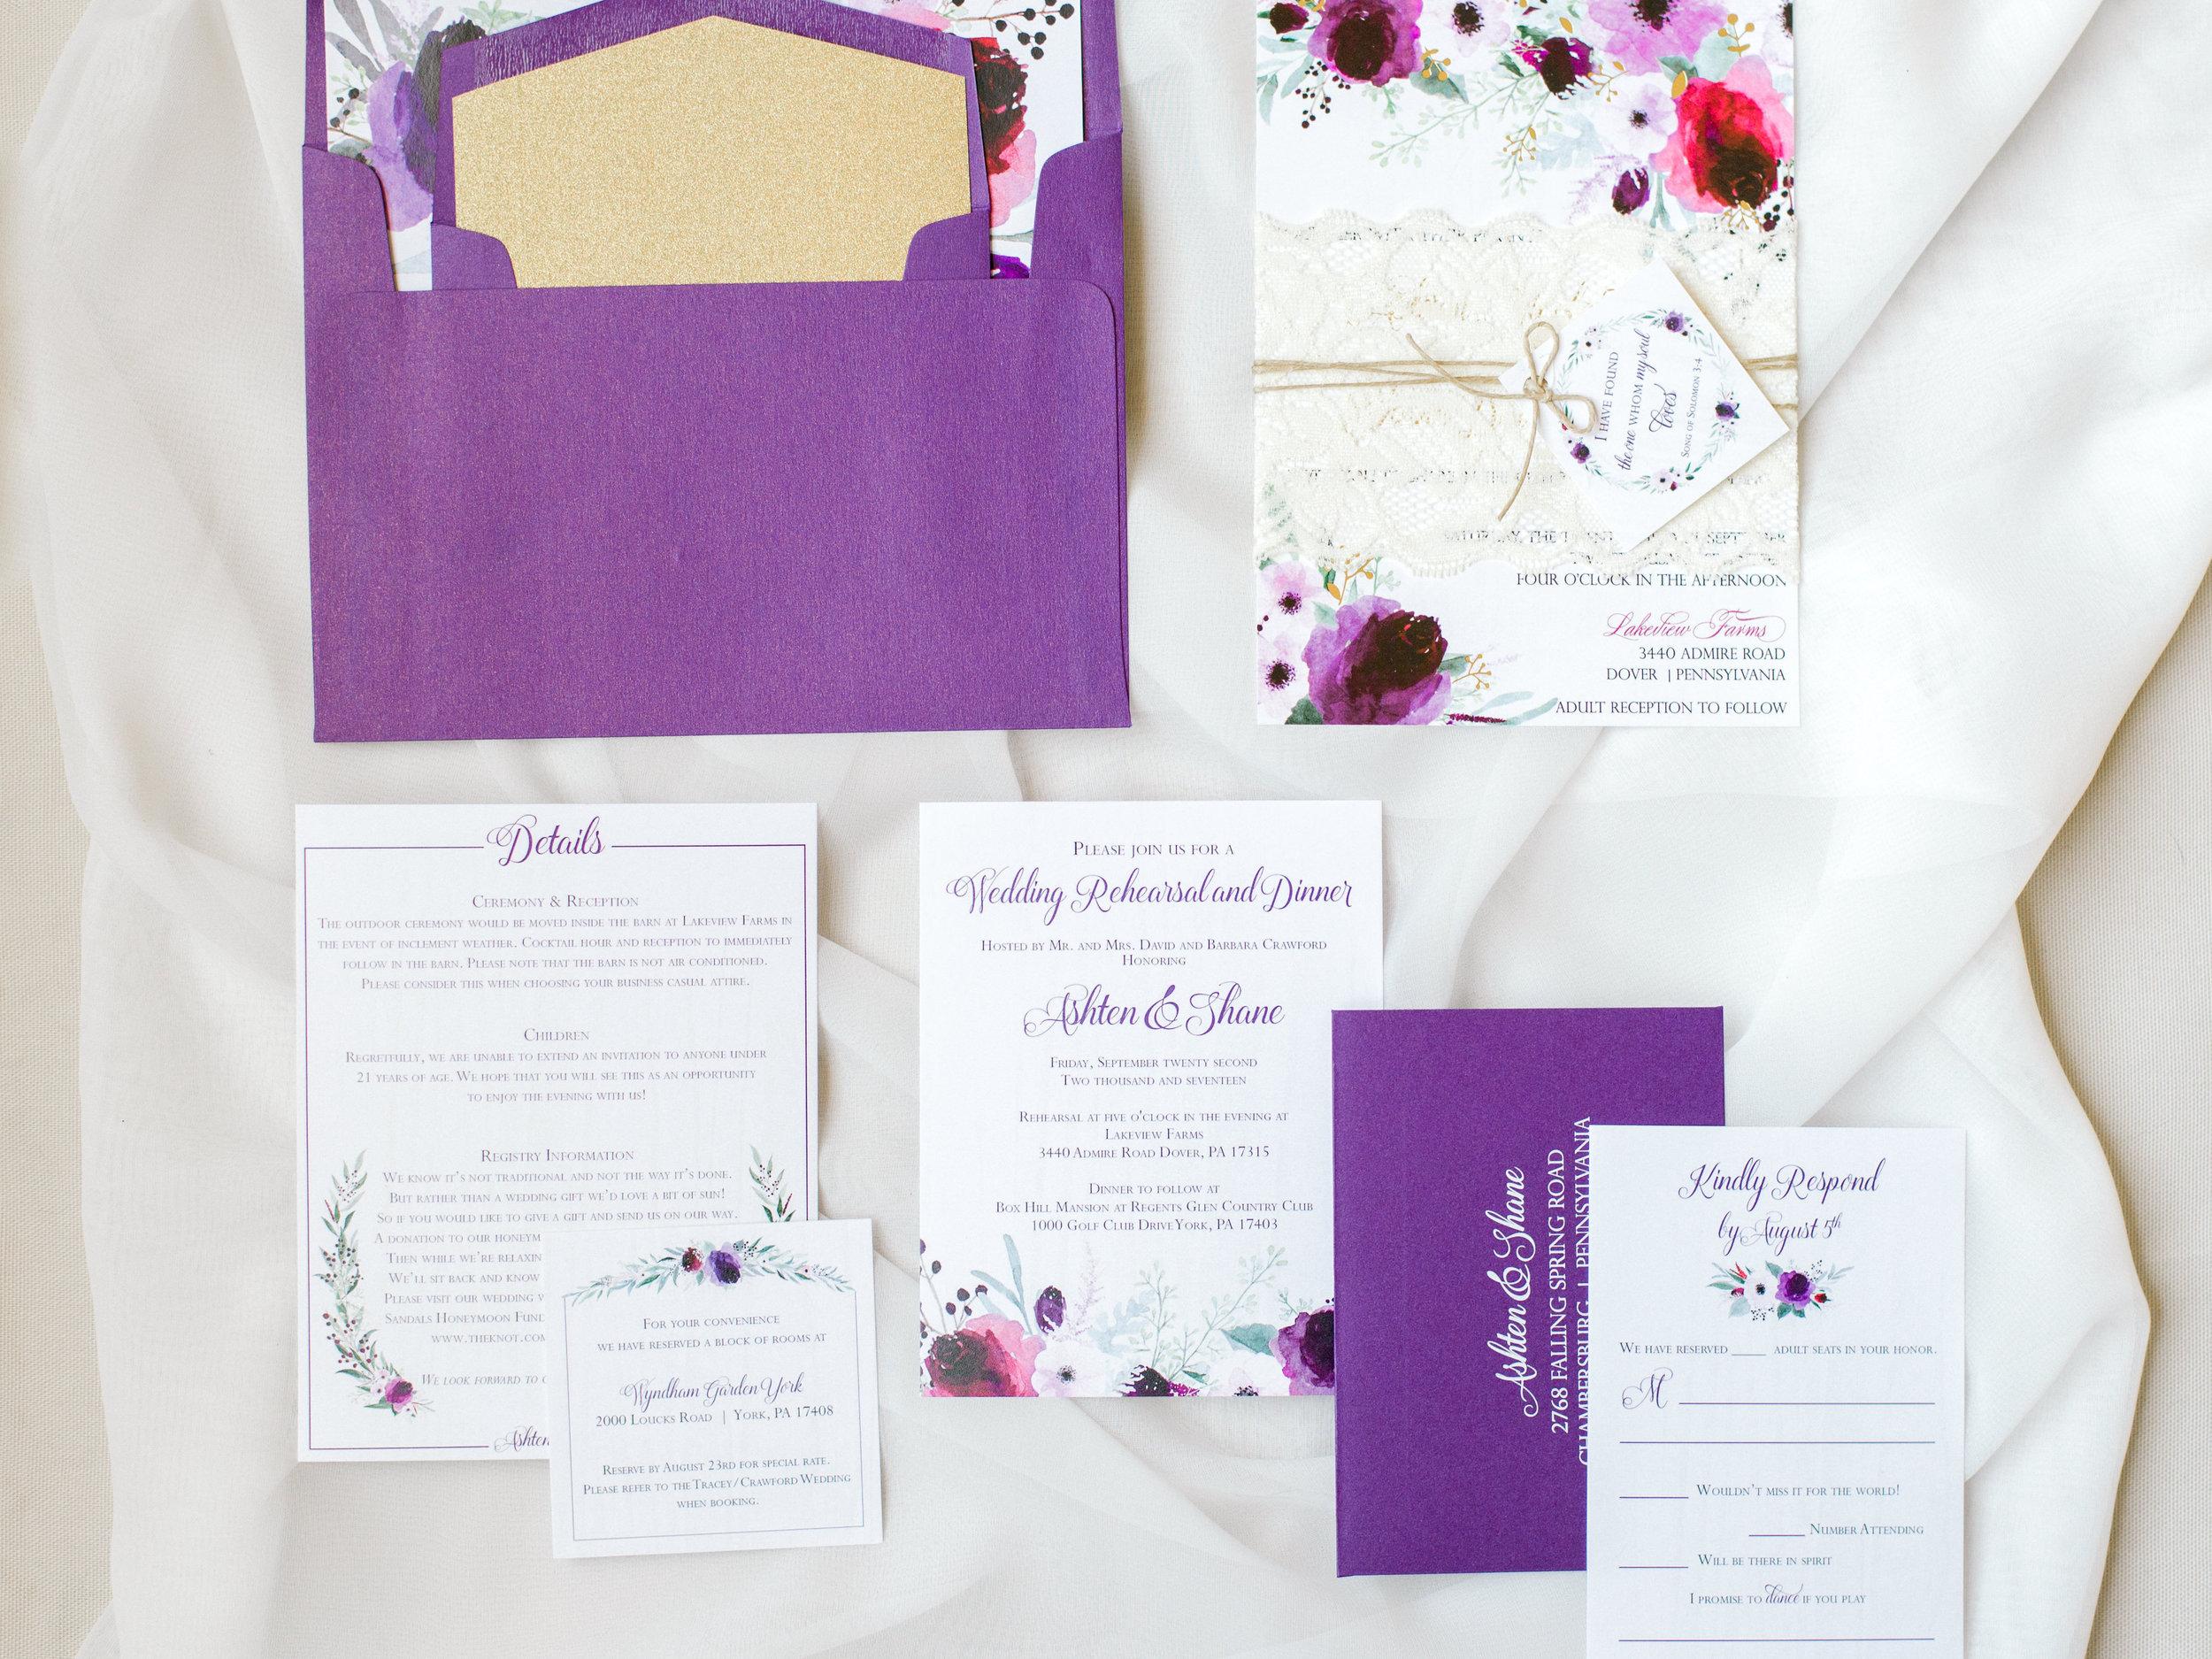 Purple Central PA, York PA, JesSmith Designs, custom, wedding, invitations, bridal, announcements, save the date, baby, hanover, calligraphy, baltimore, wedding invitations, lancaster, gettysburg Gold-0111.jpg